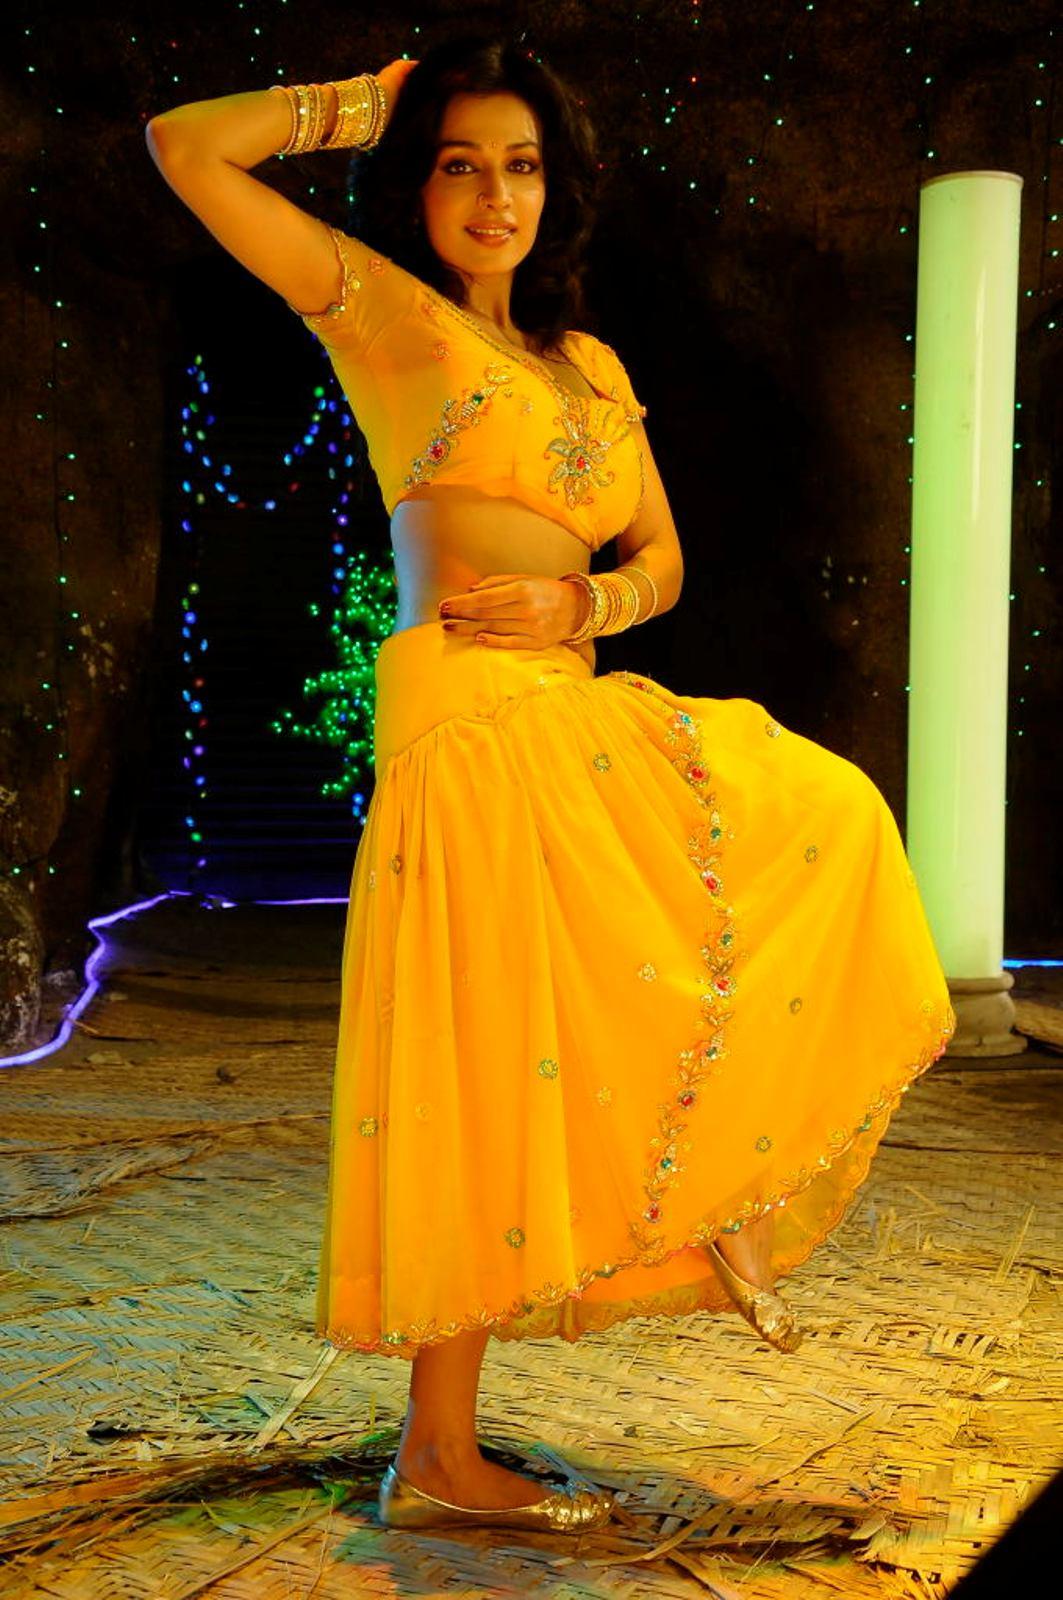 http://2.bp.blogspot.com/-H2SgJE8Whd4/UFX1IkcRC_I/AAAAAAAFKgg/IrTe306Fmmo/s1600/Asha-Saini-Dancing-Pics+%25286%2529.JPG